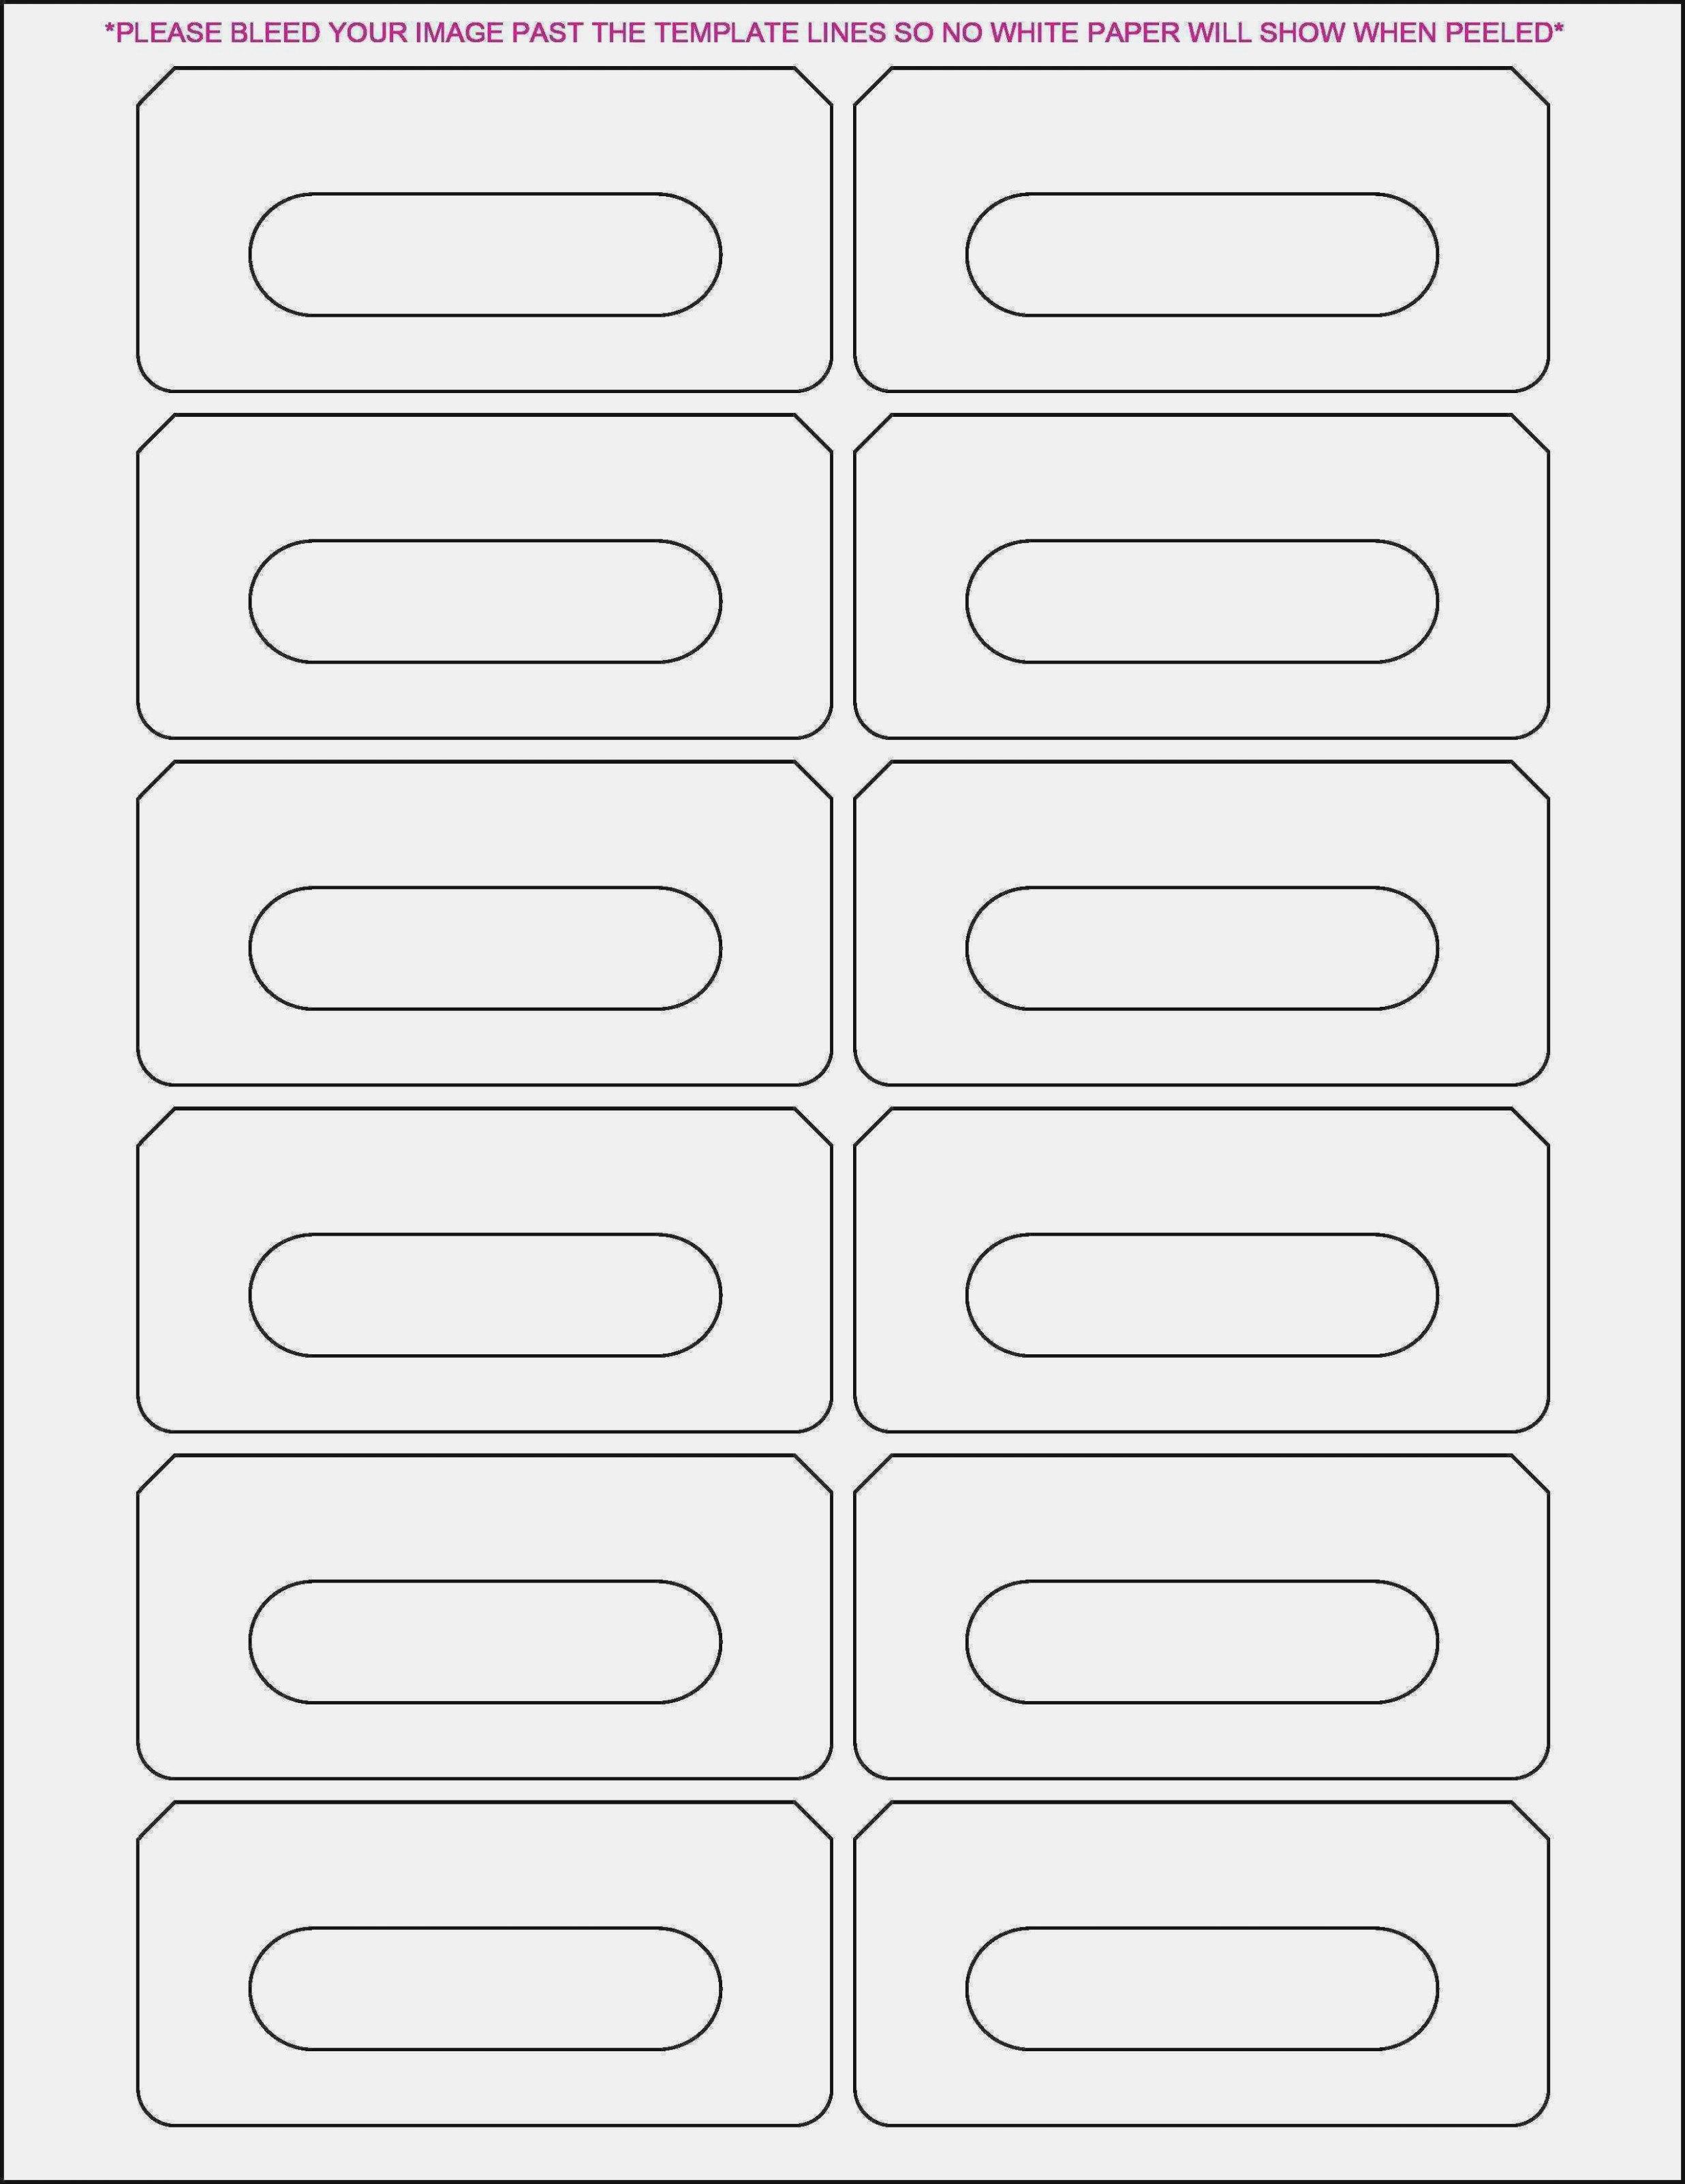 Pendaflex Template Pretty Printable Tabs Template Pendaflex Hanging Throughout Pendaflex Label Template